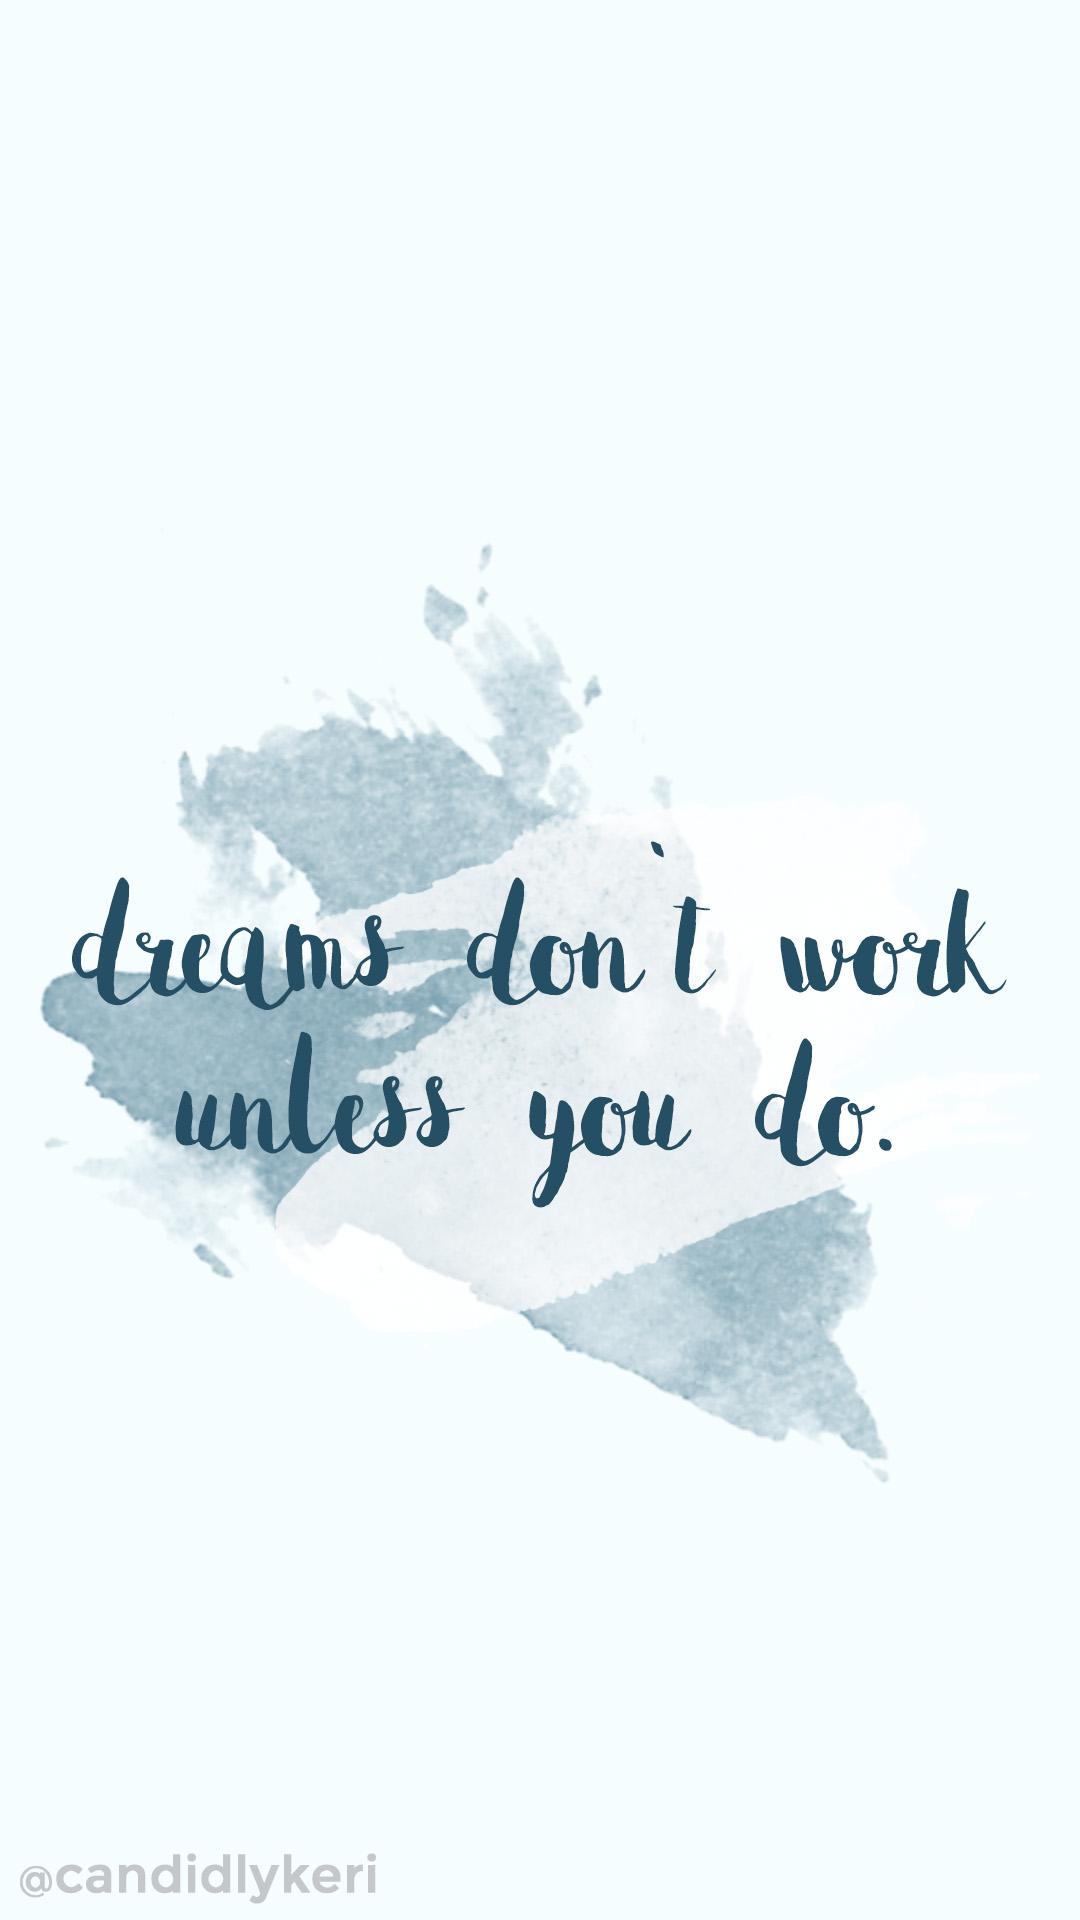 ddcfeedccff-inspiring-backgrounds-motivational-backgrounds-iphone-wallpaper-wpc5801412